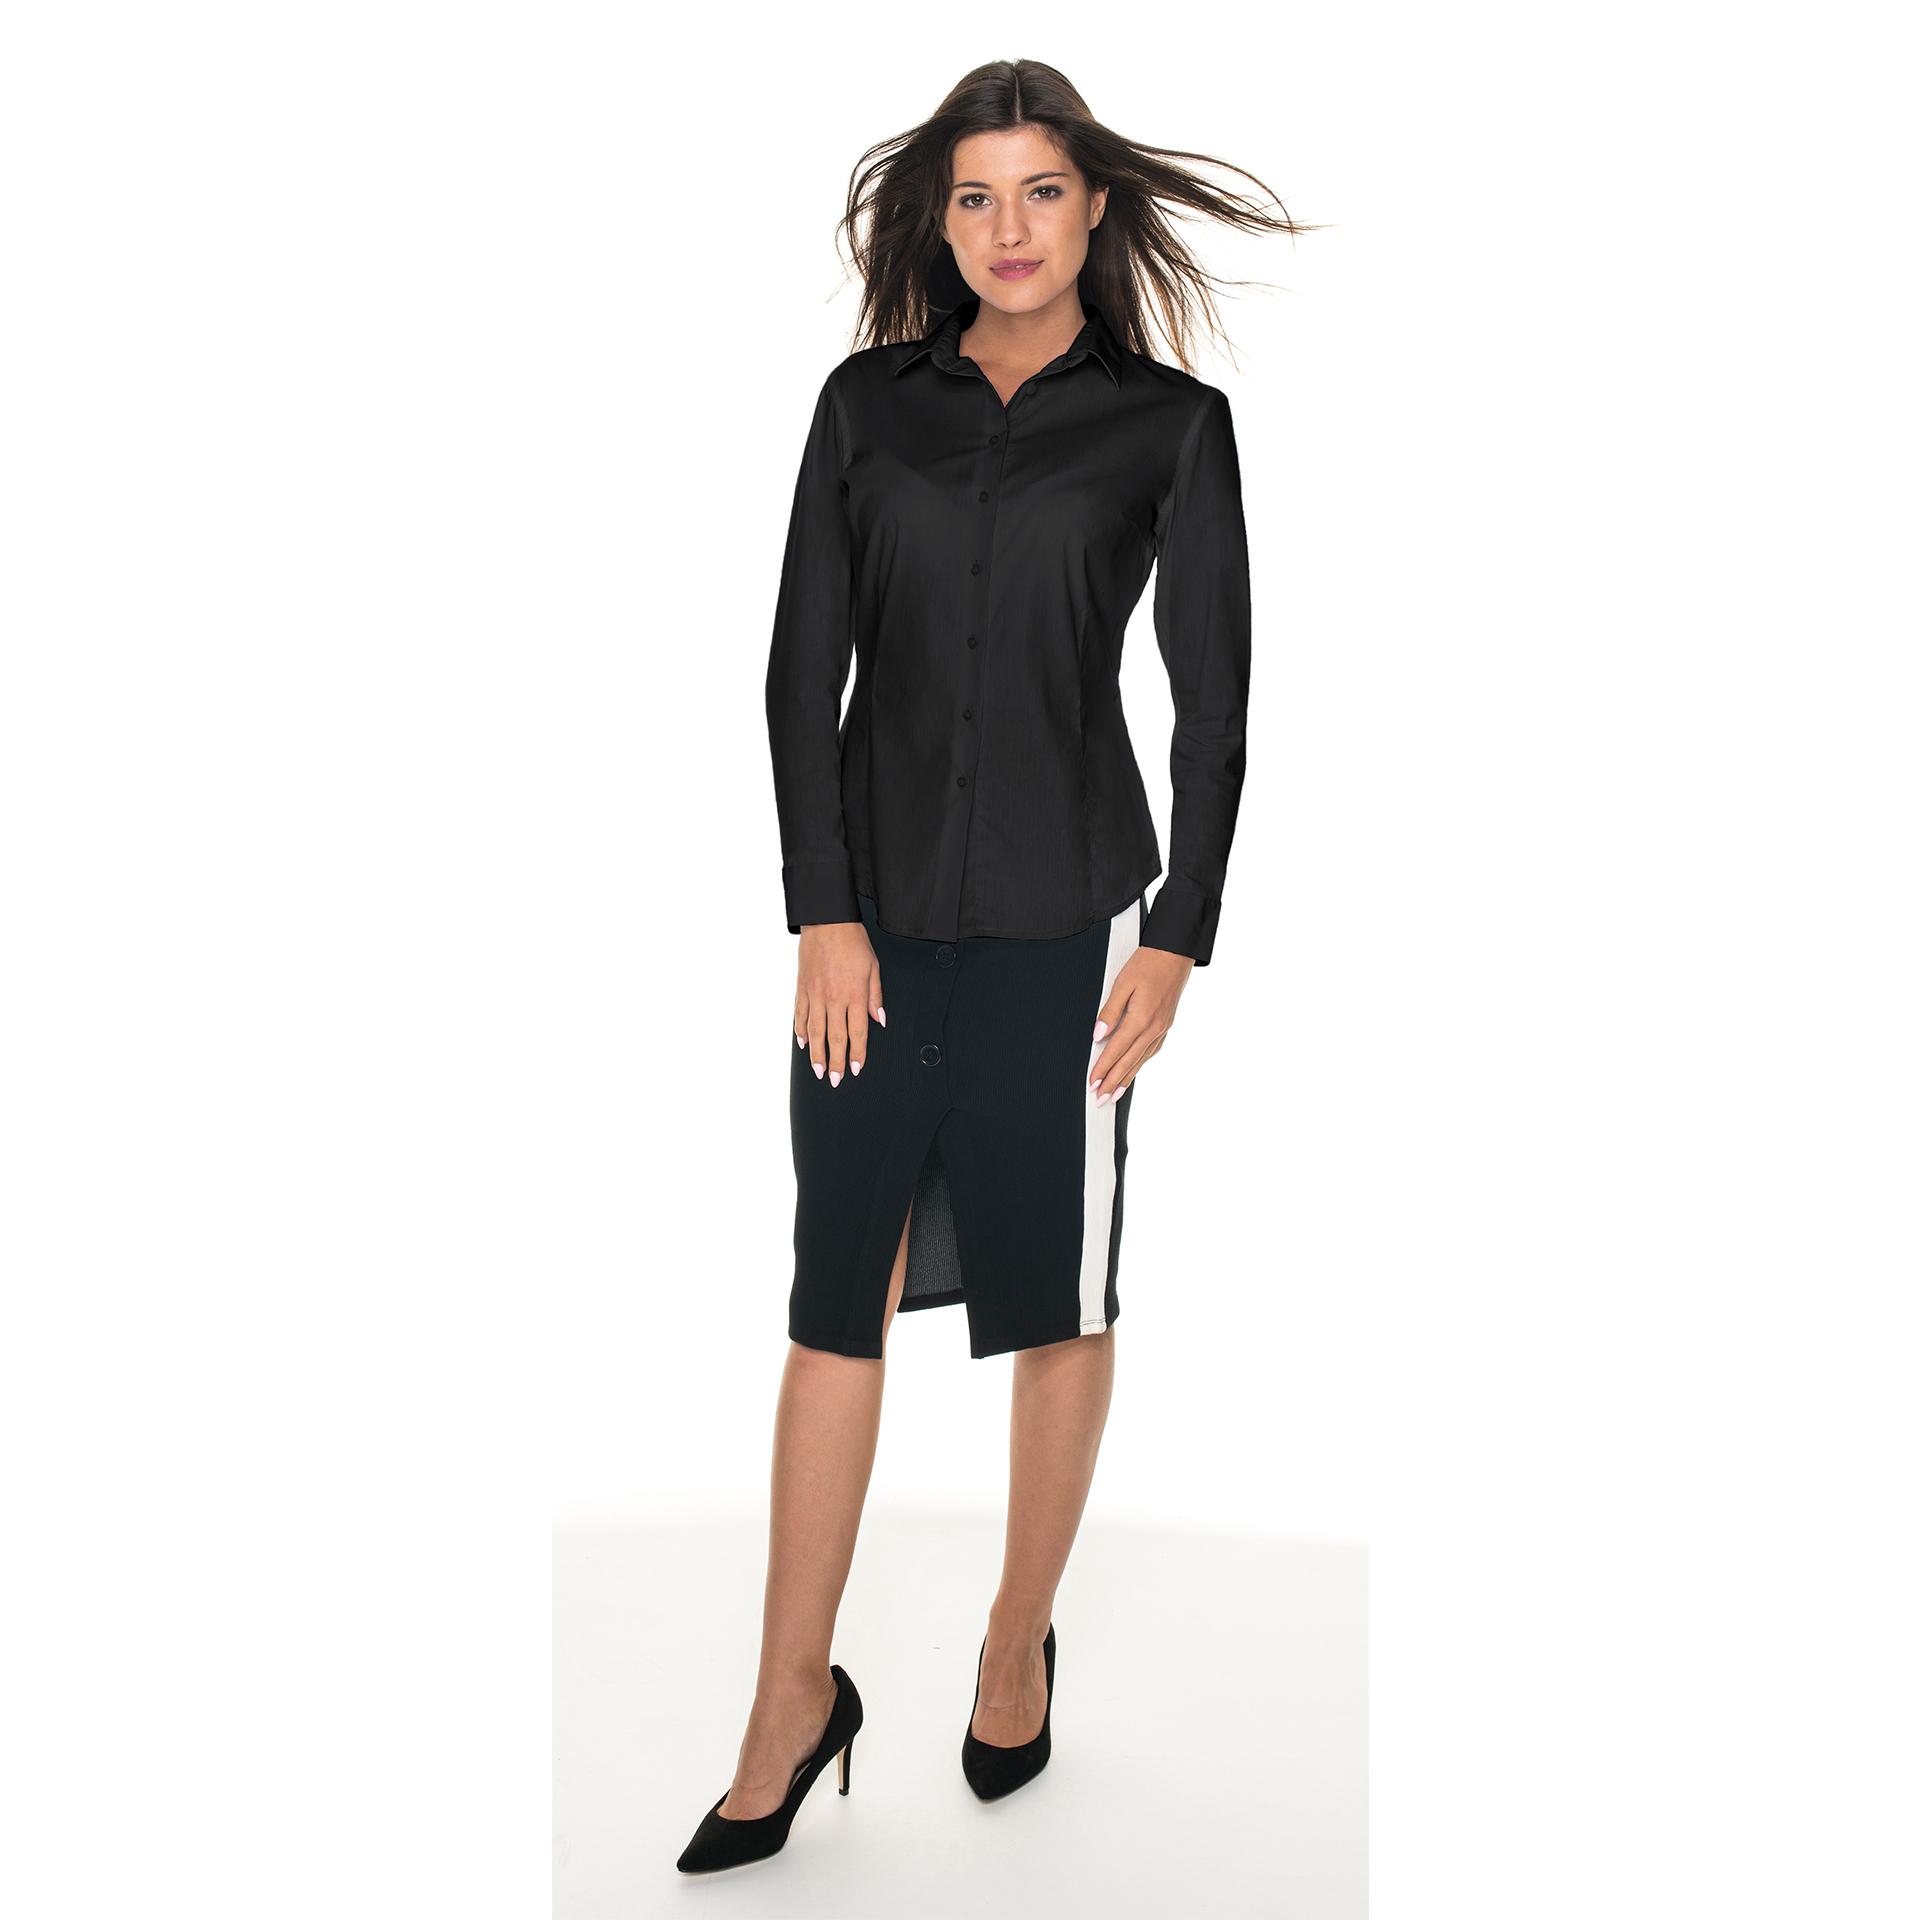 weave czarna damska